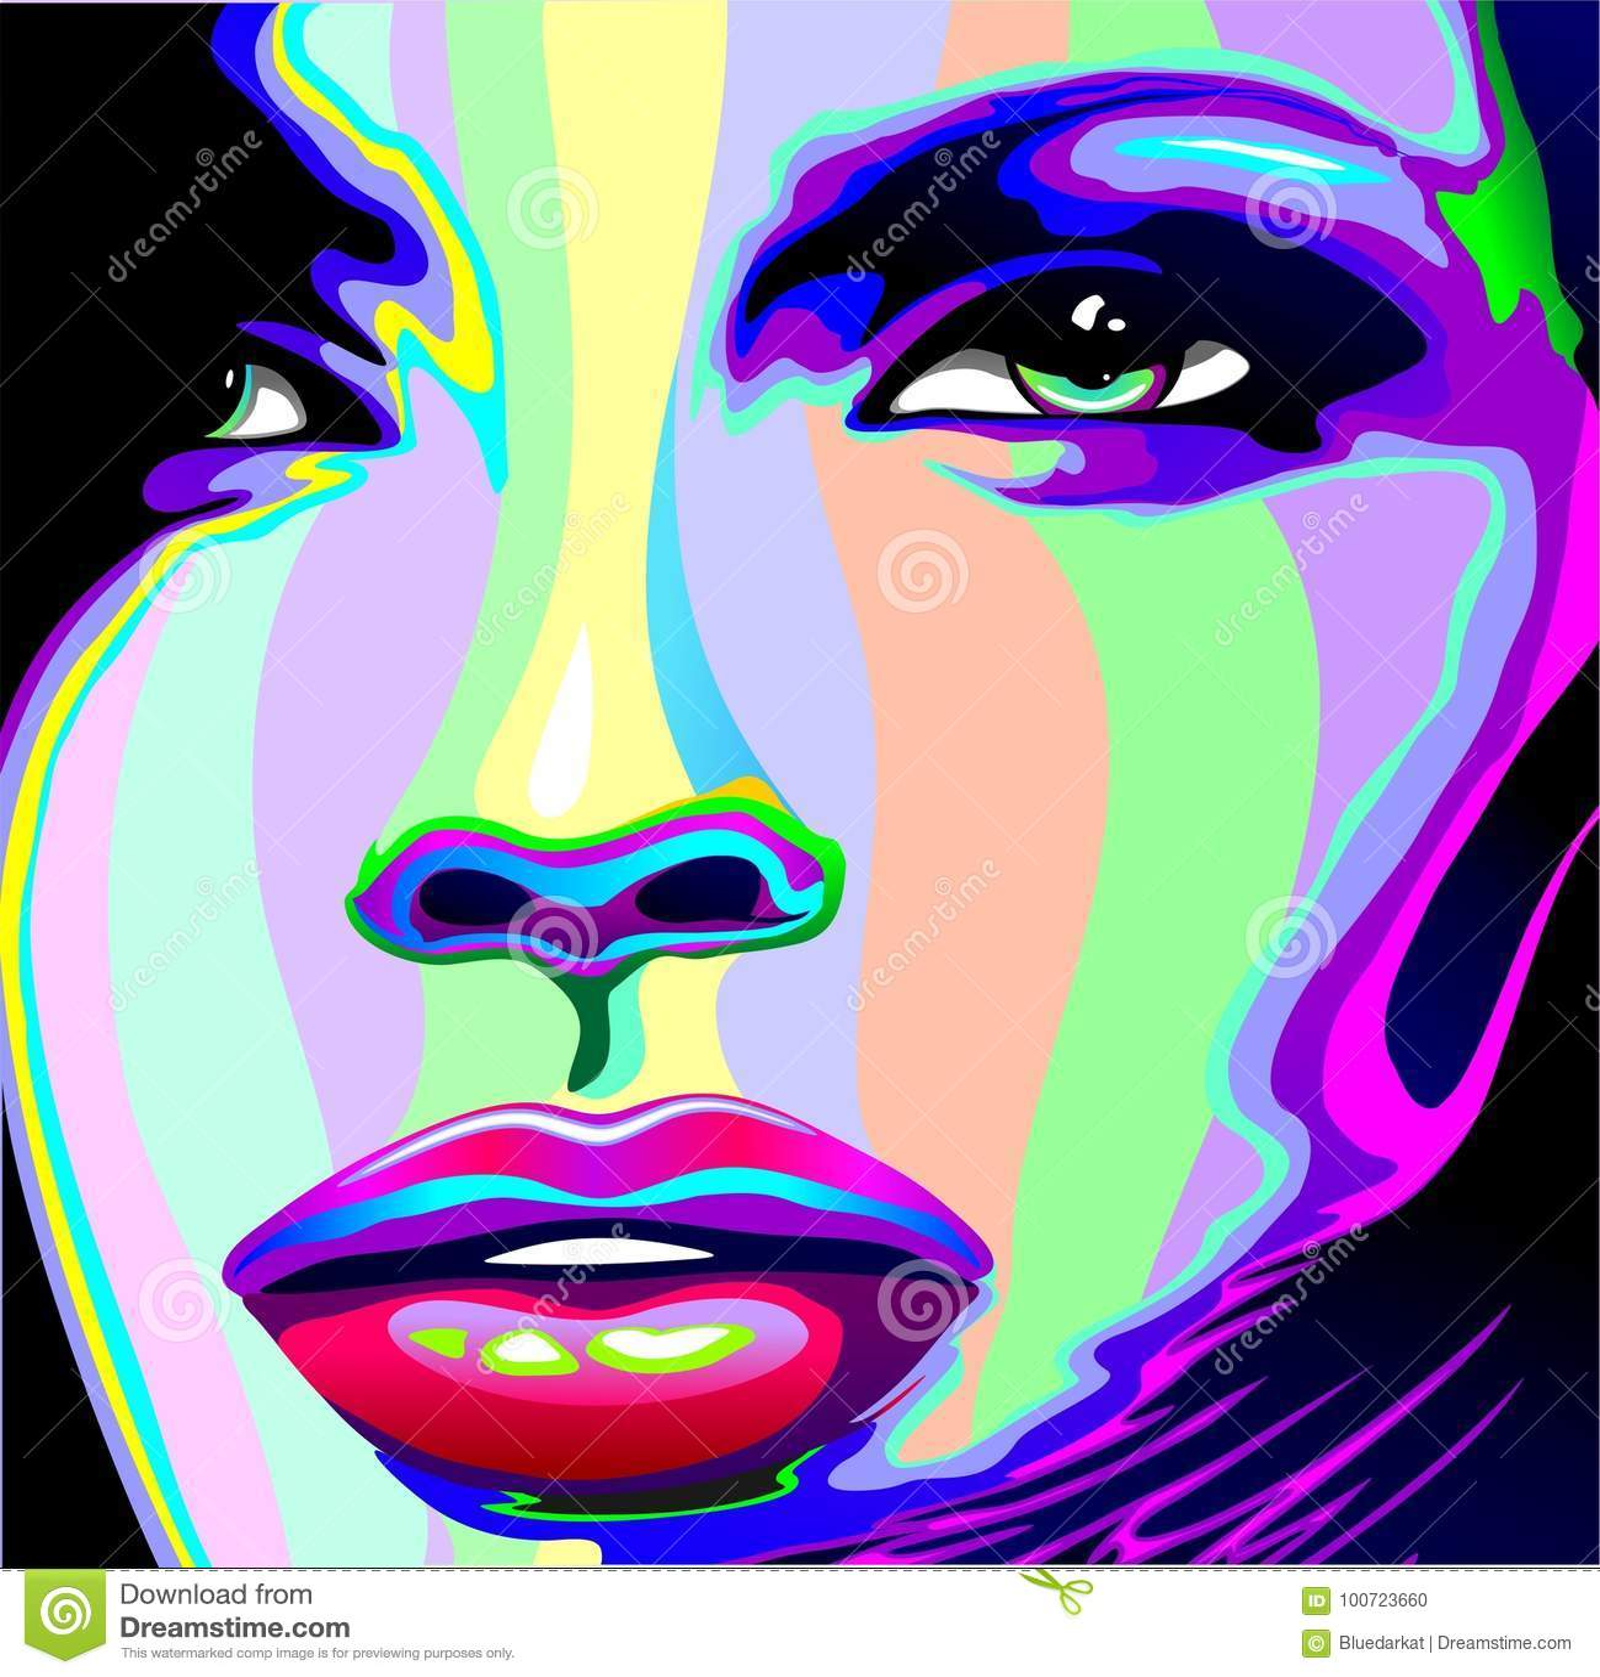 girl rainbow psychedelic portrait stock vector image 100723660. Black Bedroom Furniture Sets. Home Design Ideas